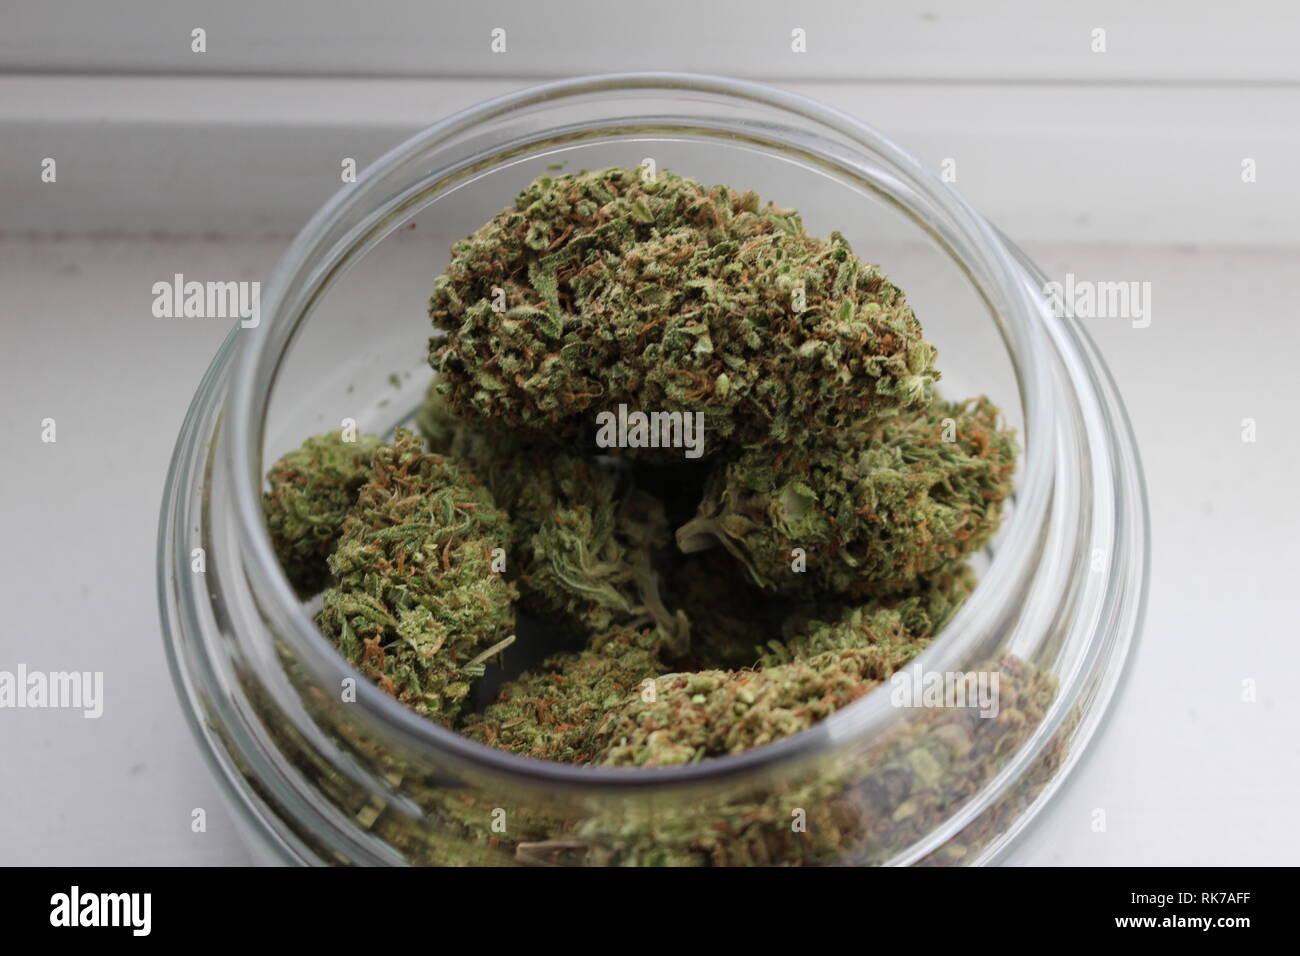 Fat Weed Nugs in Glass Jar - Stock Image